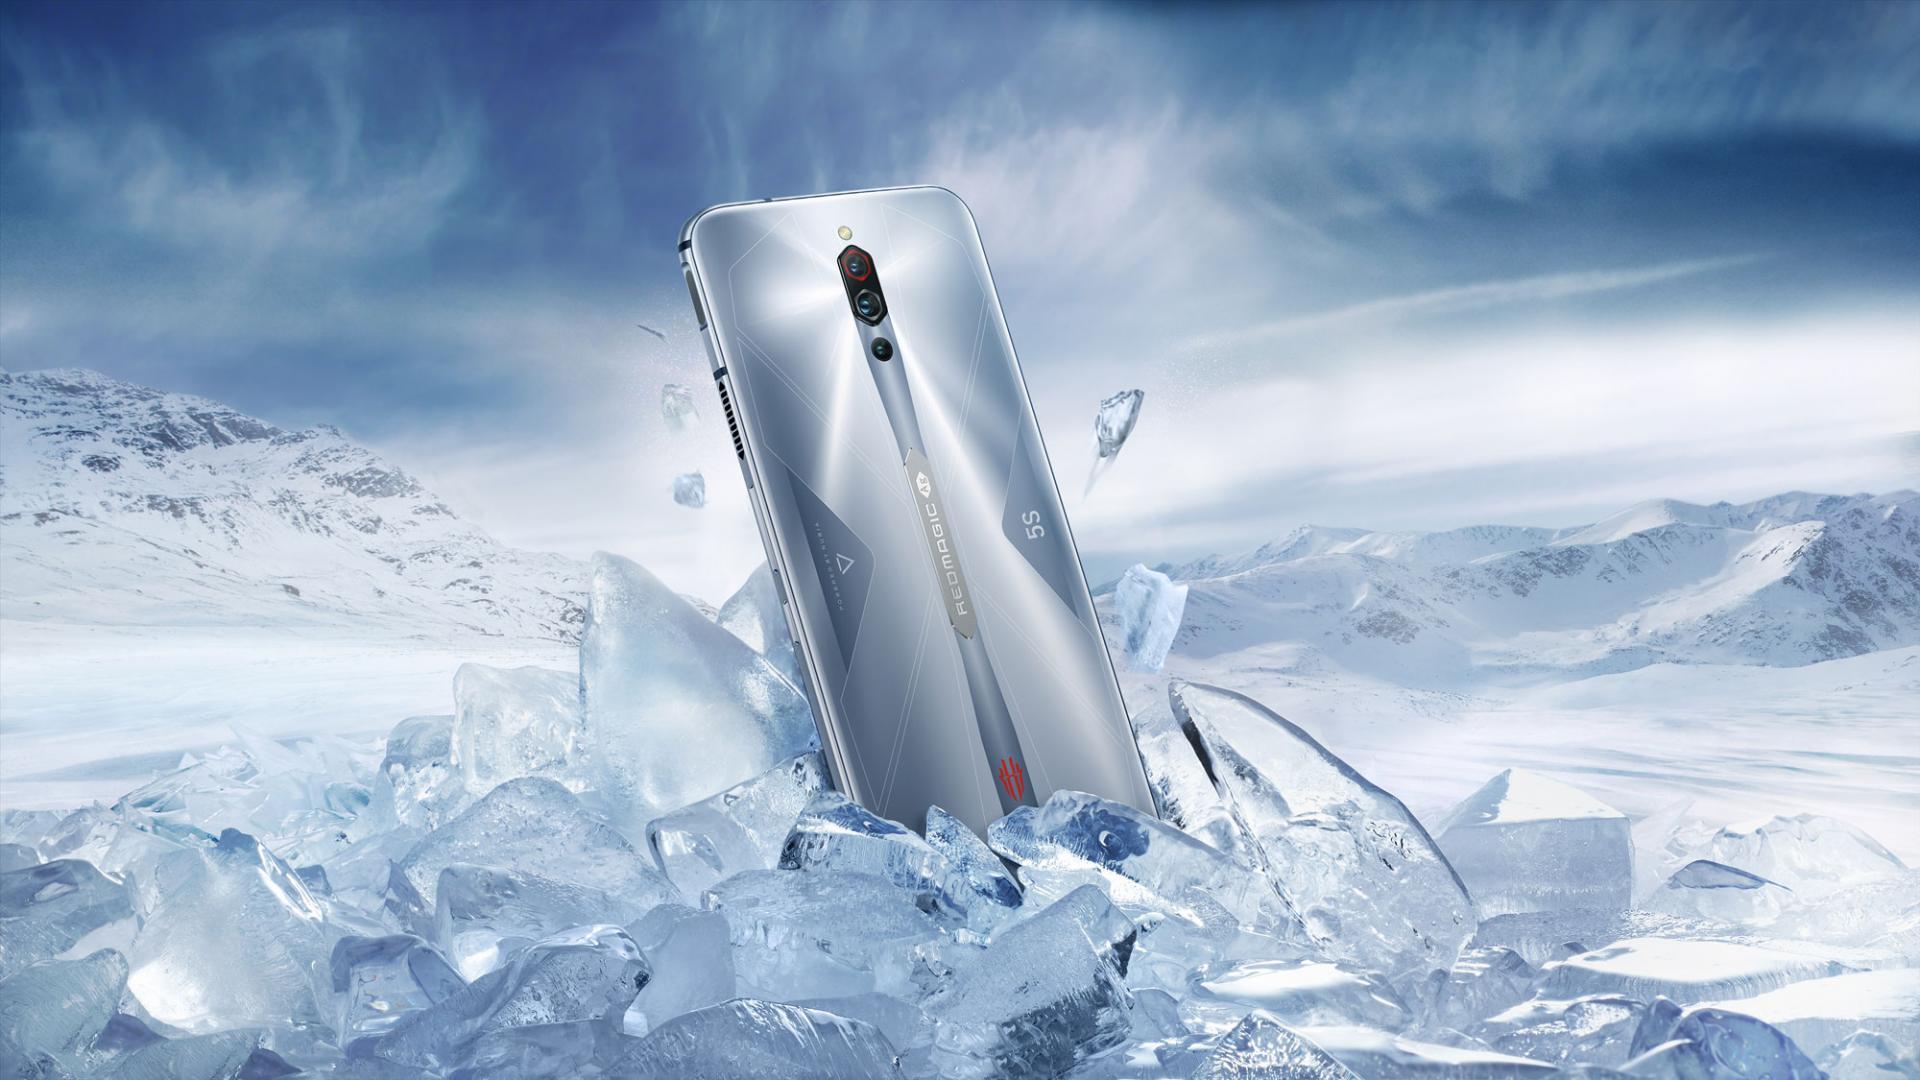 Смартфон RedMagic 5s от ZTE: специальная цена и подарки для покупателей